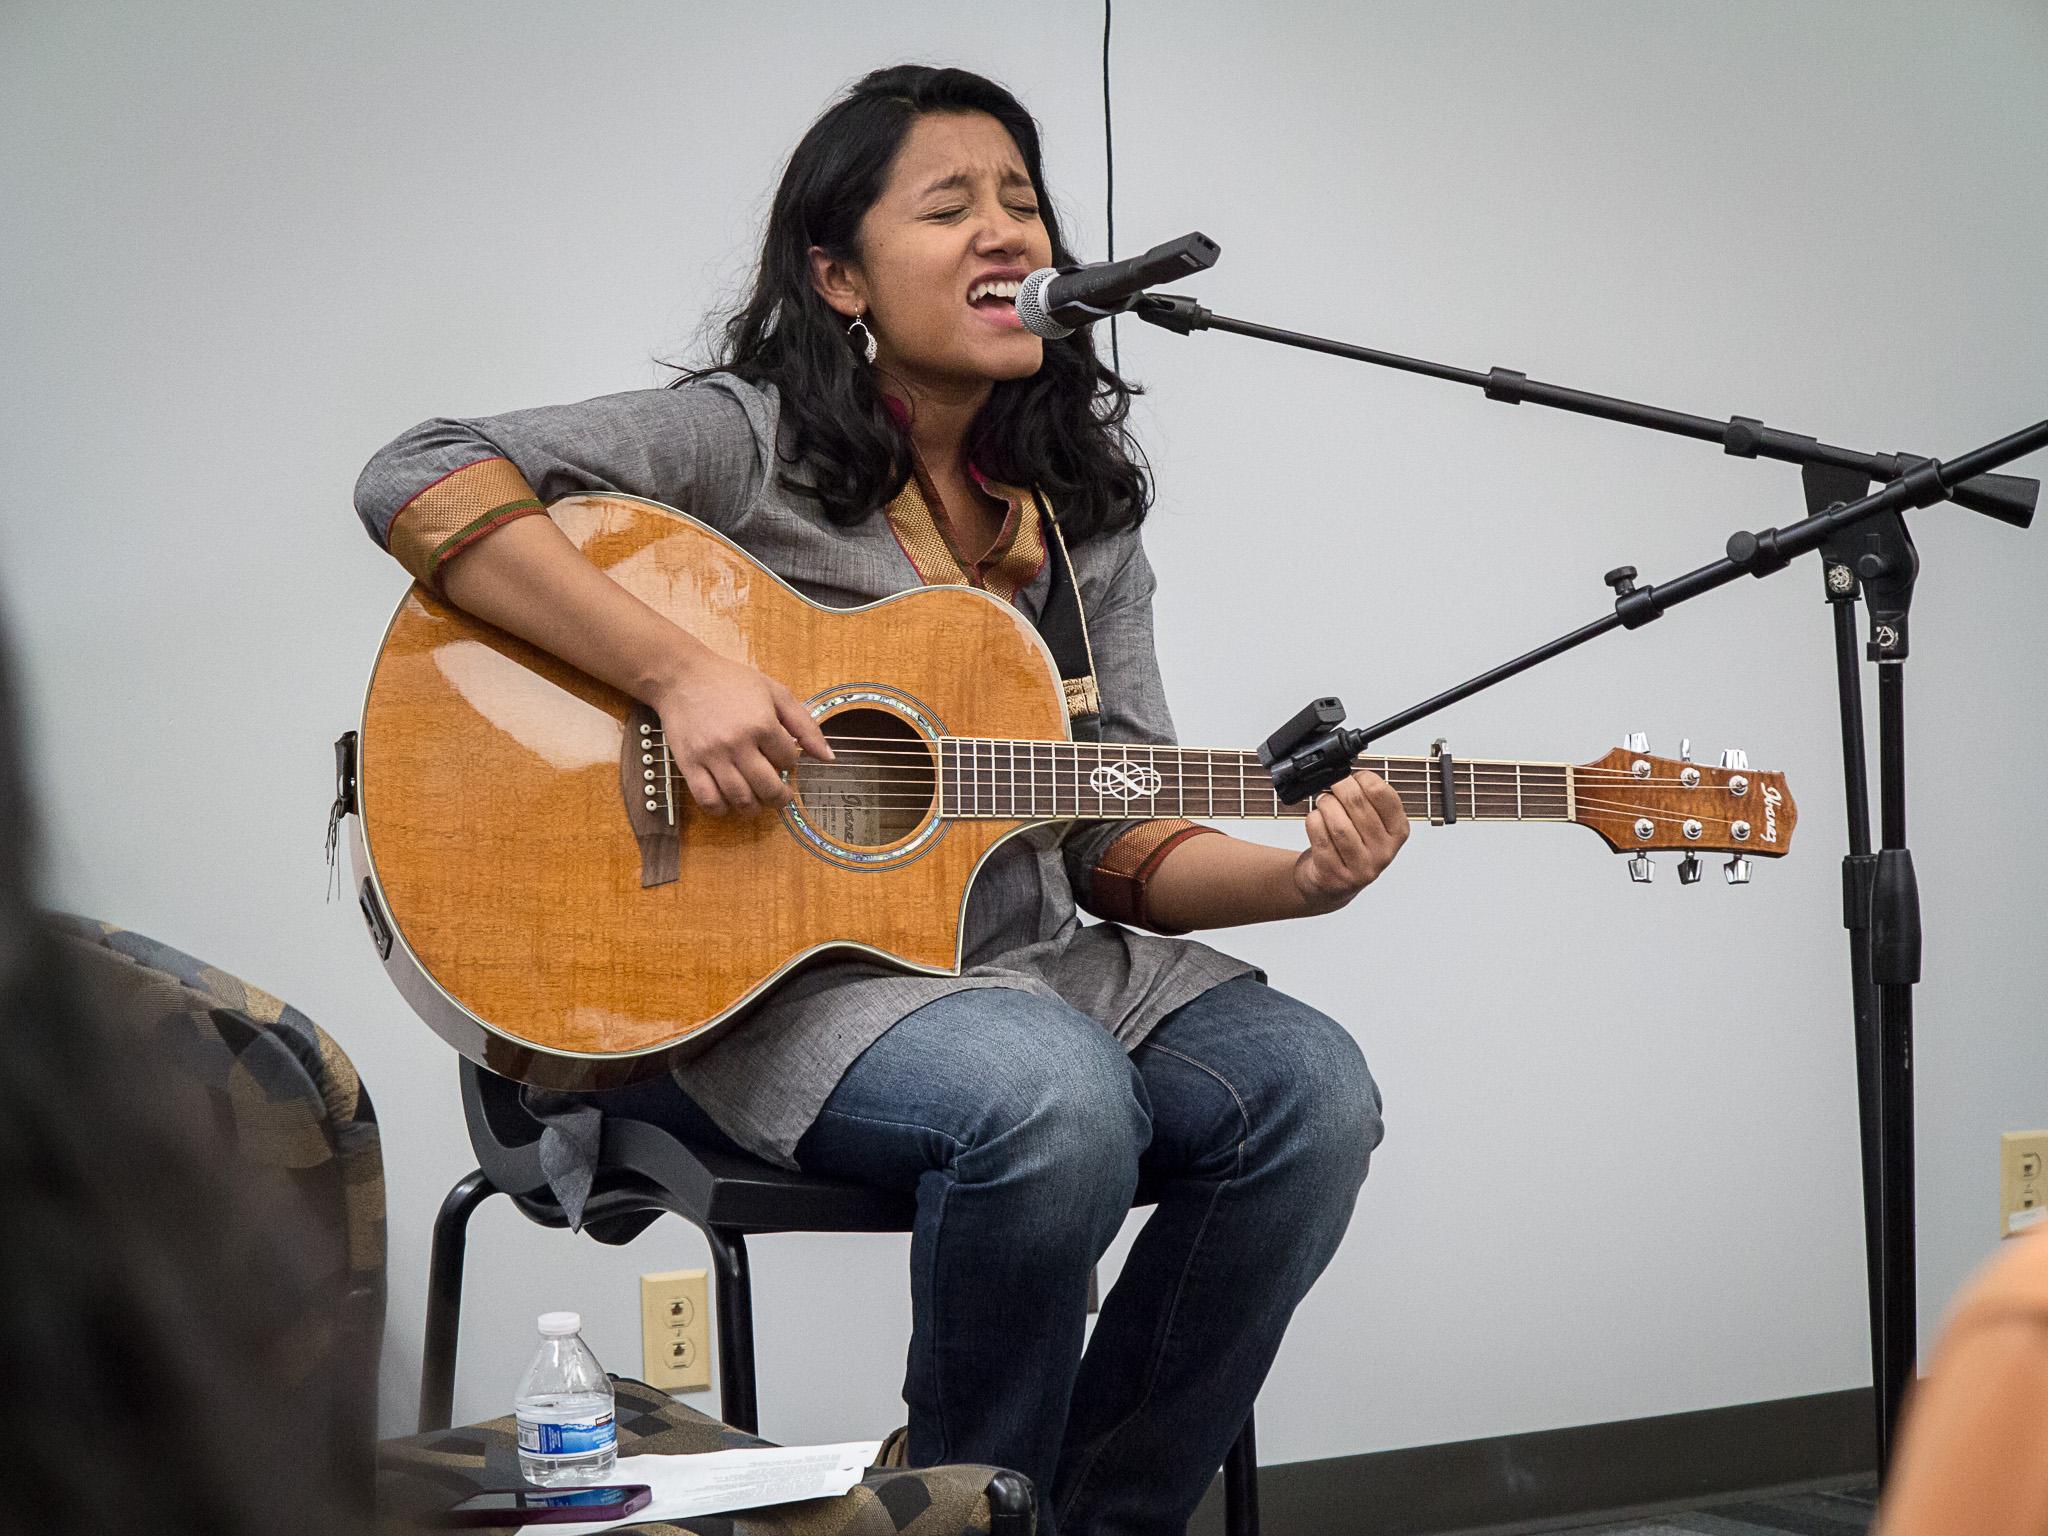 Malini D. Sur's singing performance